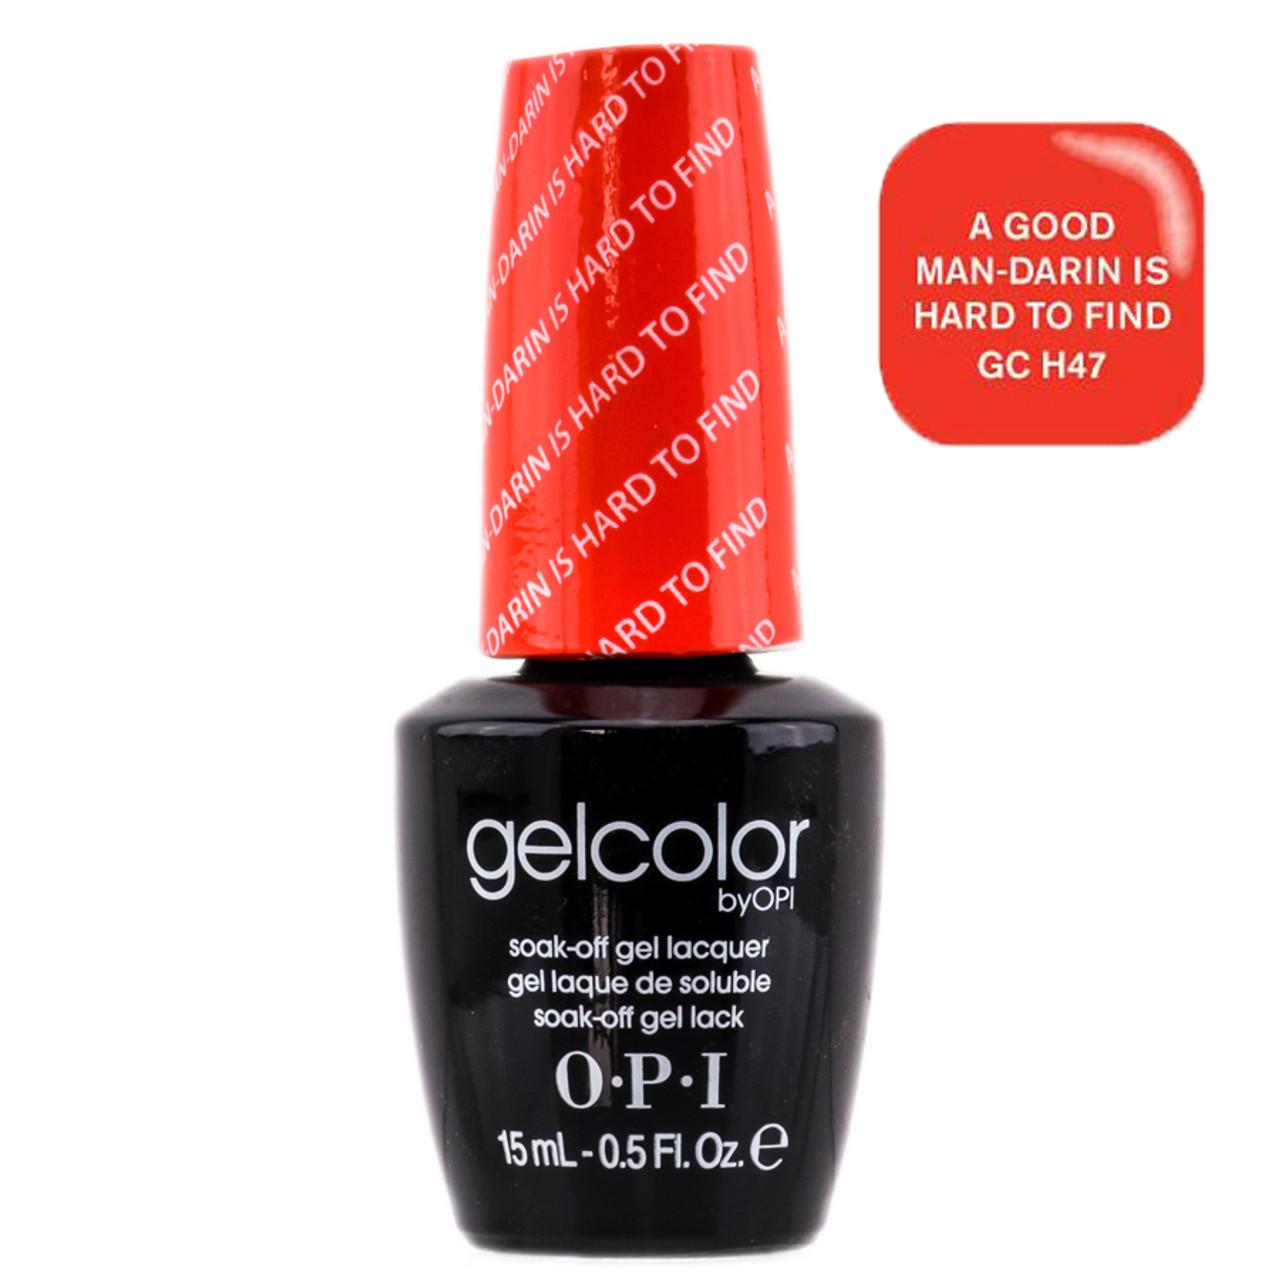 Gelcolor By Opi Soak Off Gel Lacquer Nail Polish Sleekshop Com